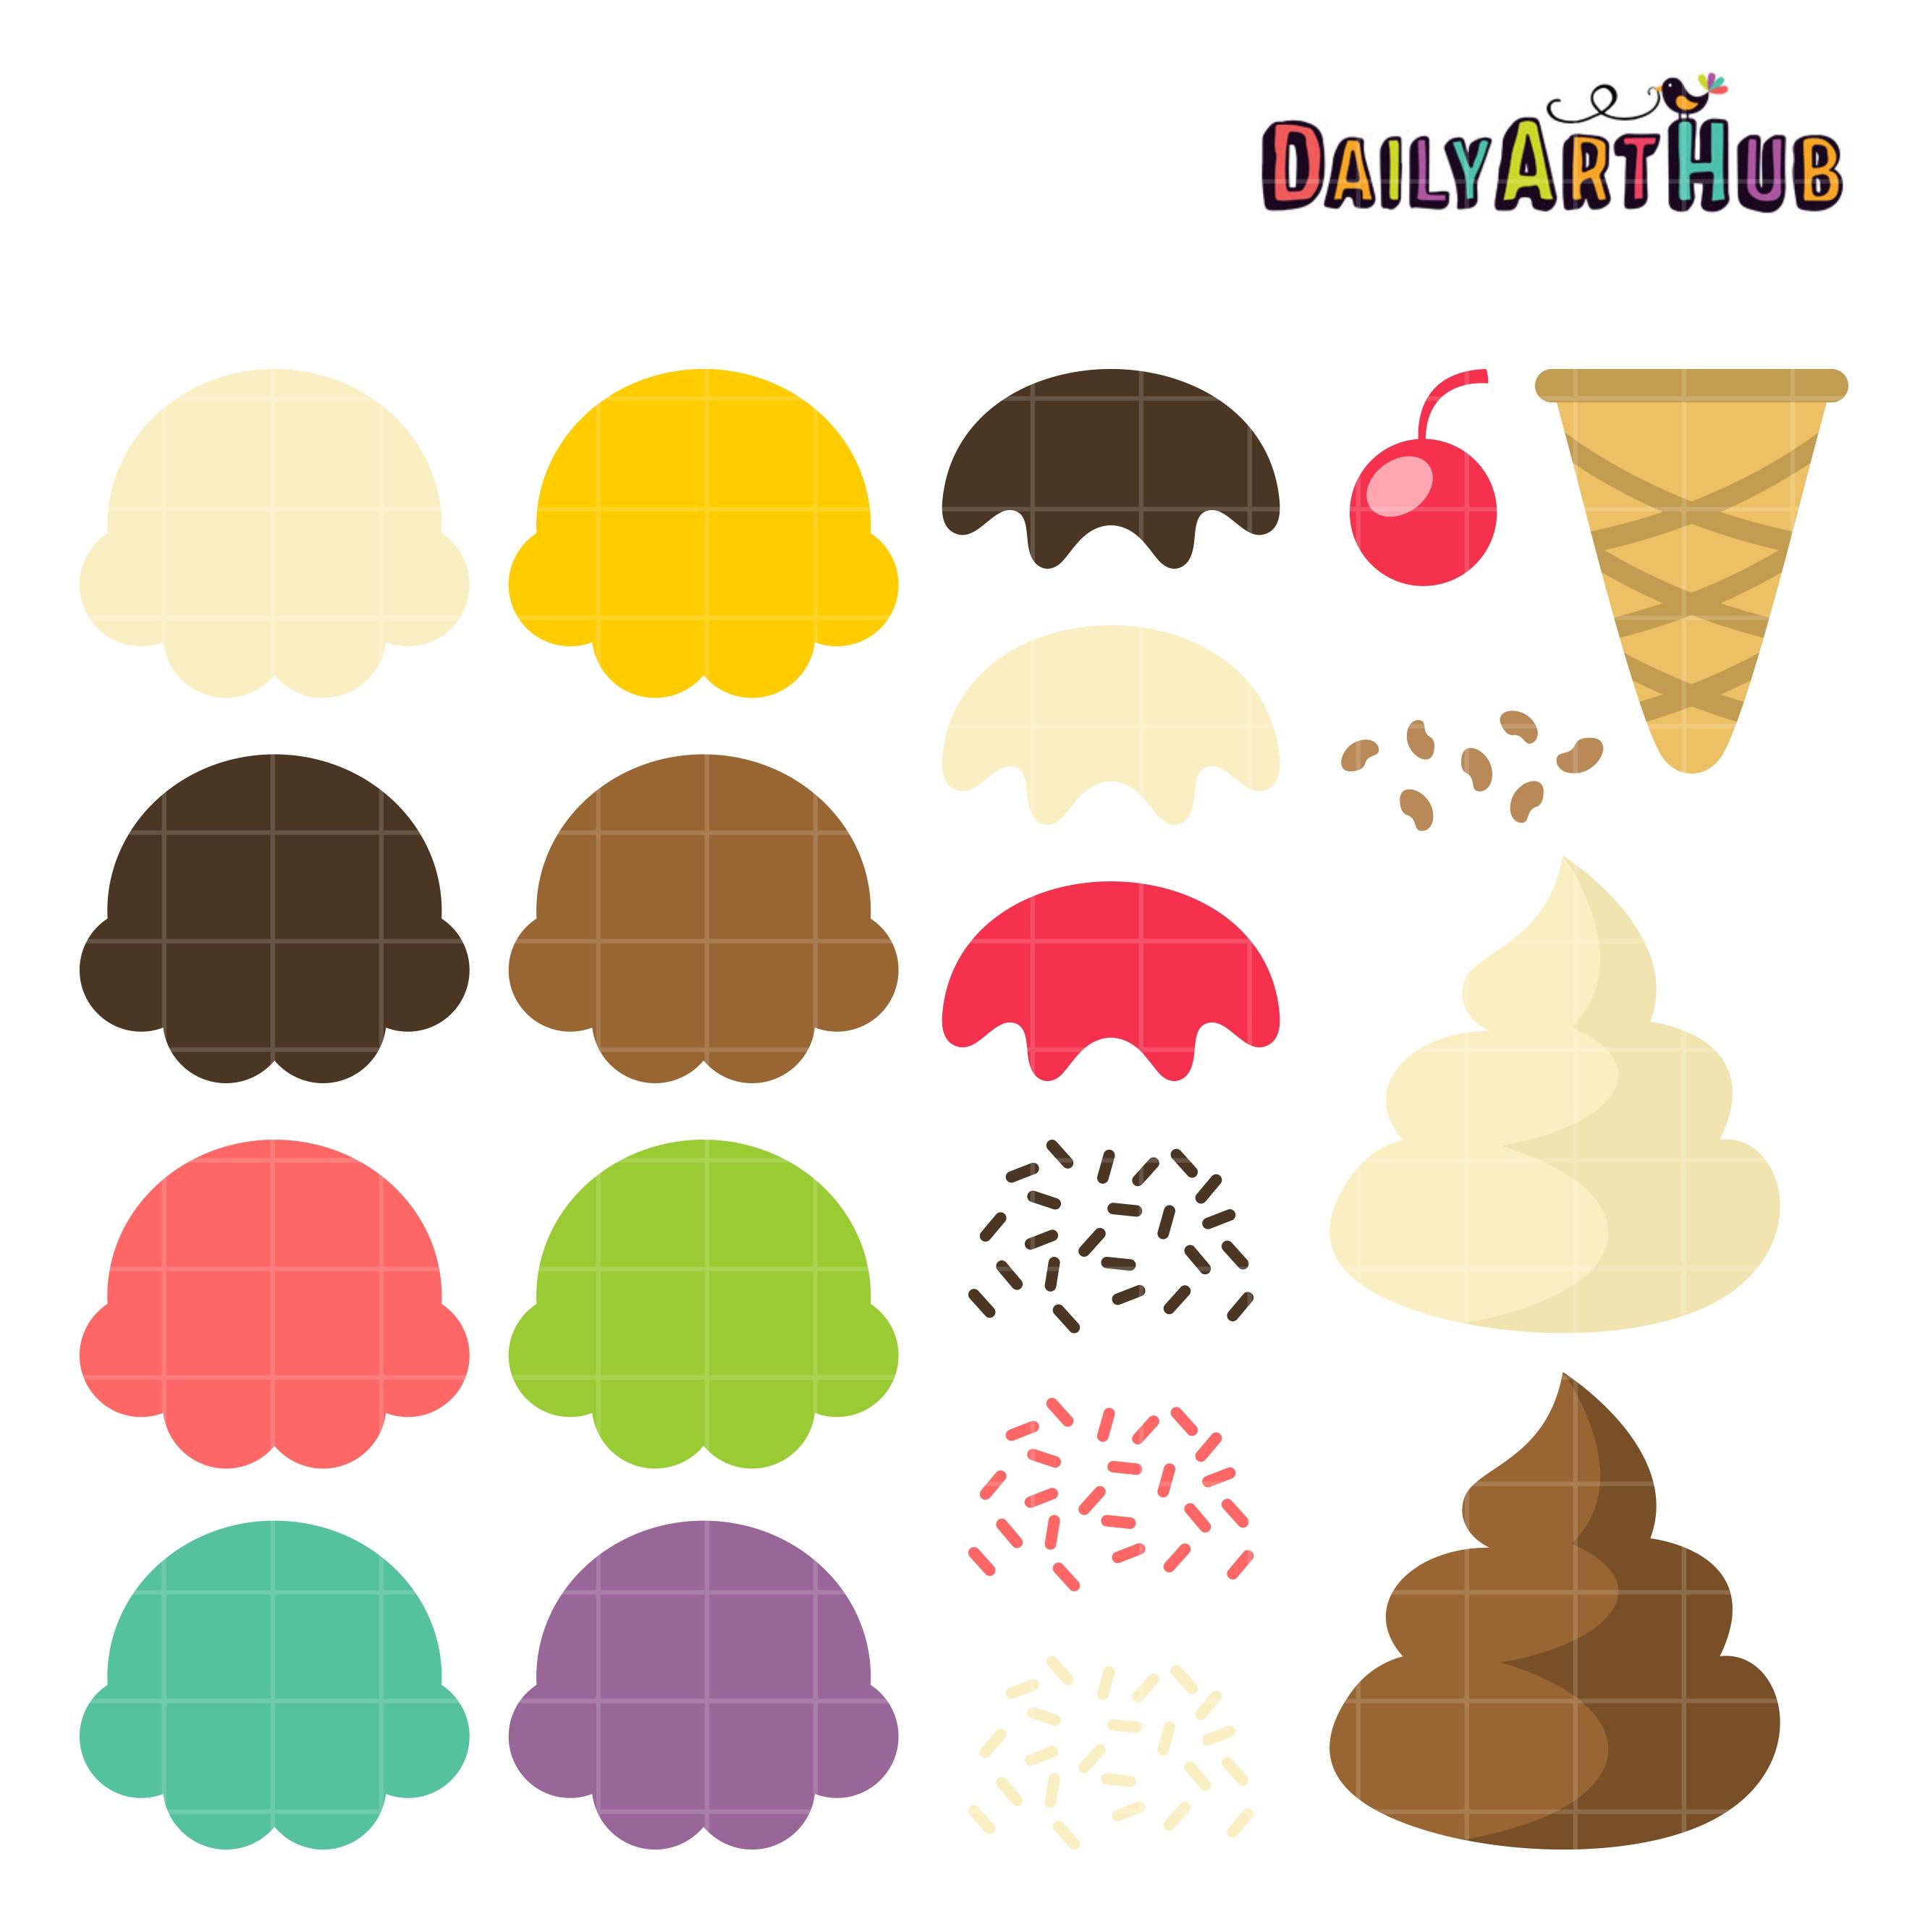 Your Ice Cream Cone Clip Art Set | Daily Art Hub